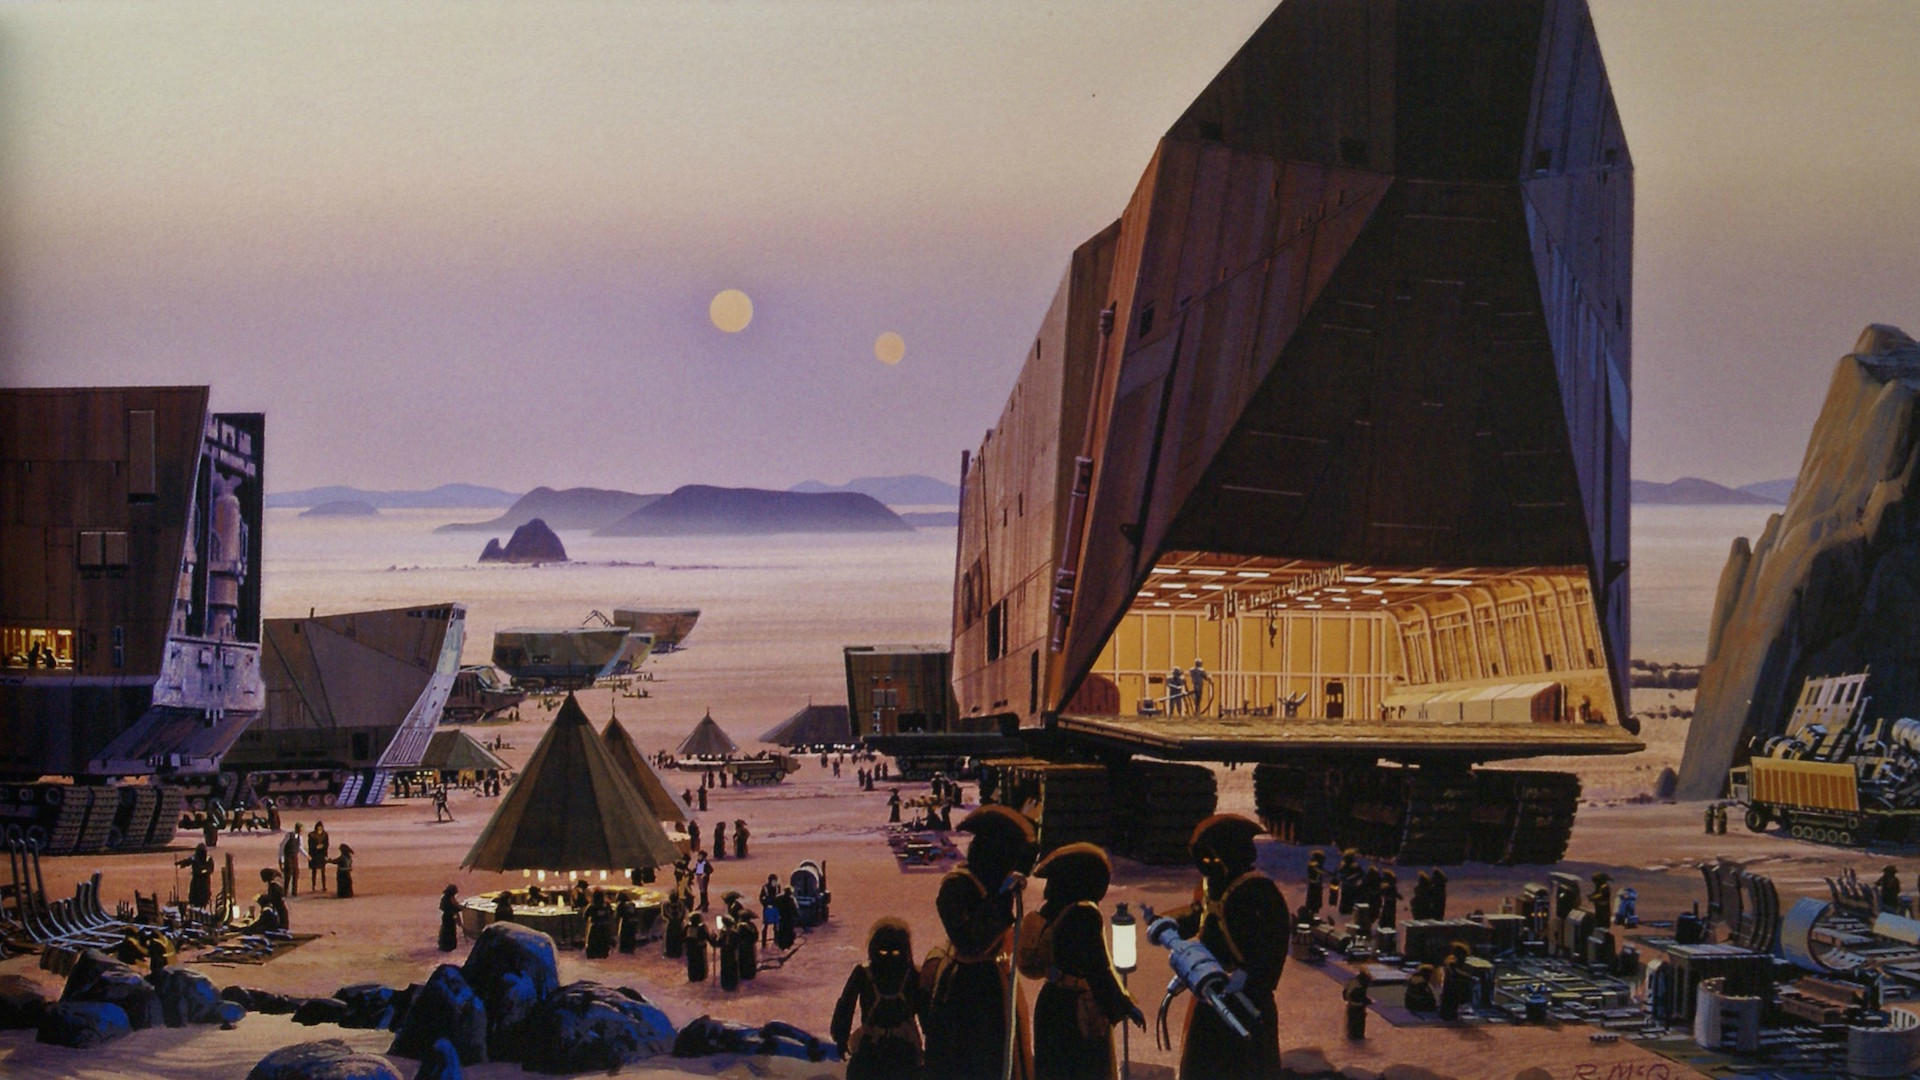 Star Wars Concept Art Wallpaper (67+ images)